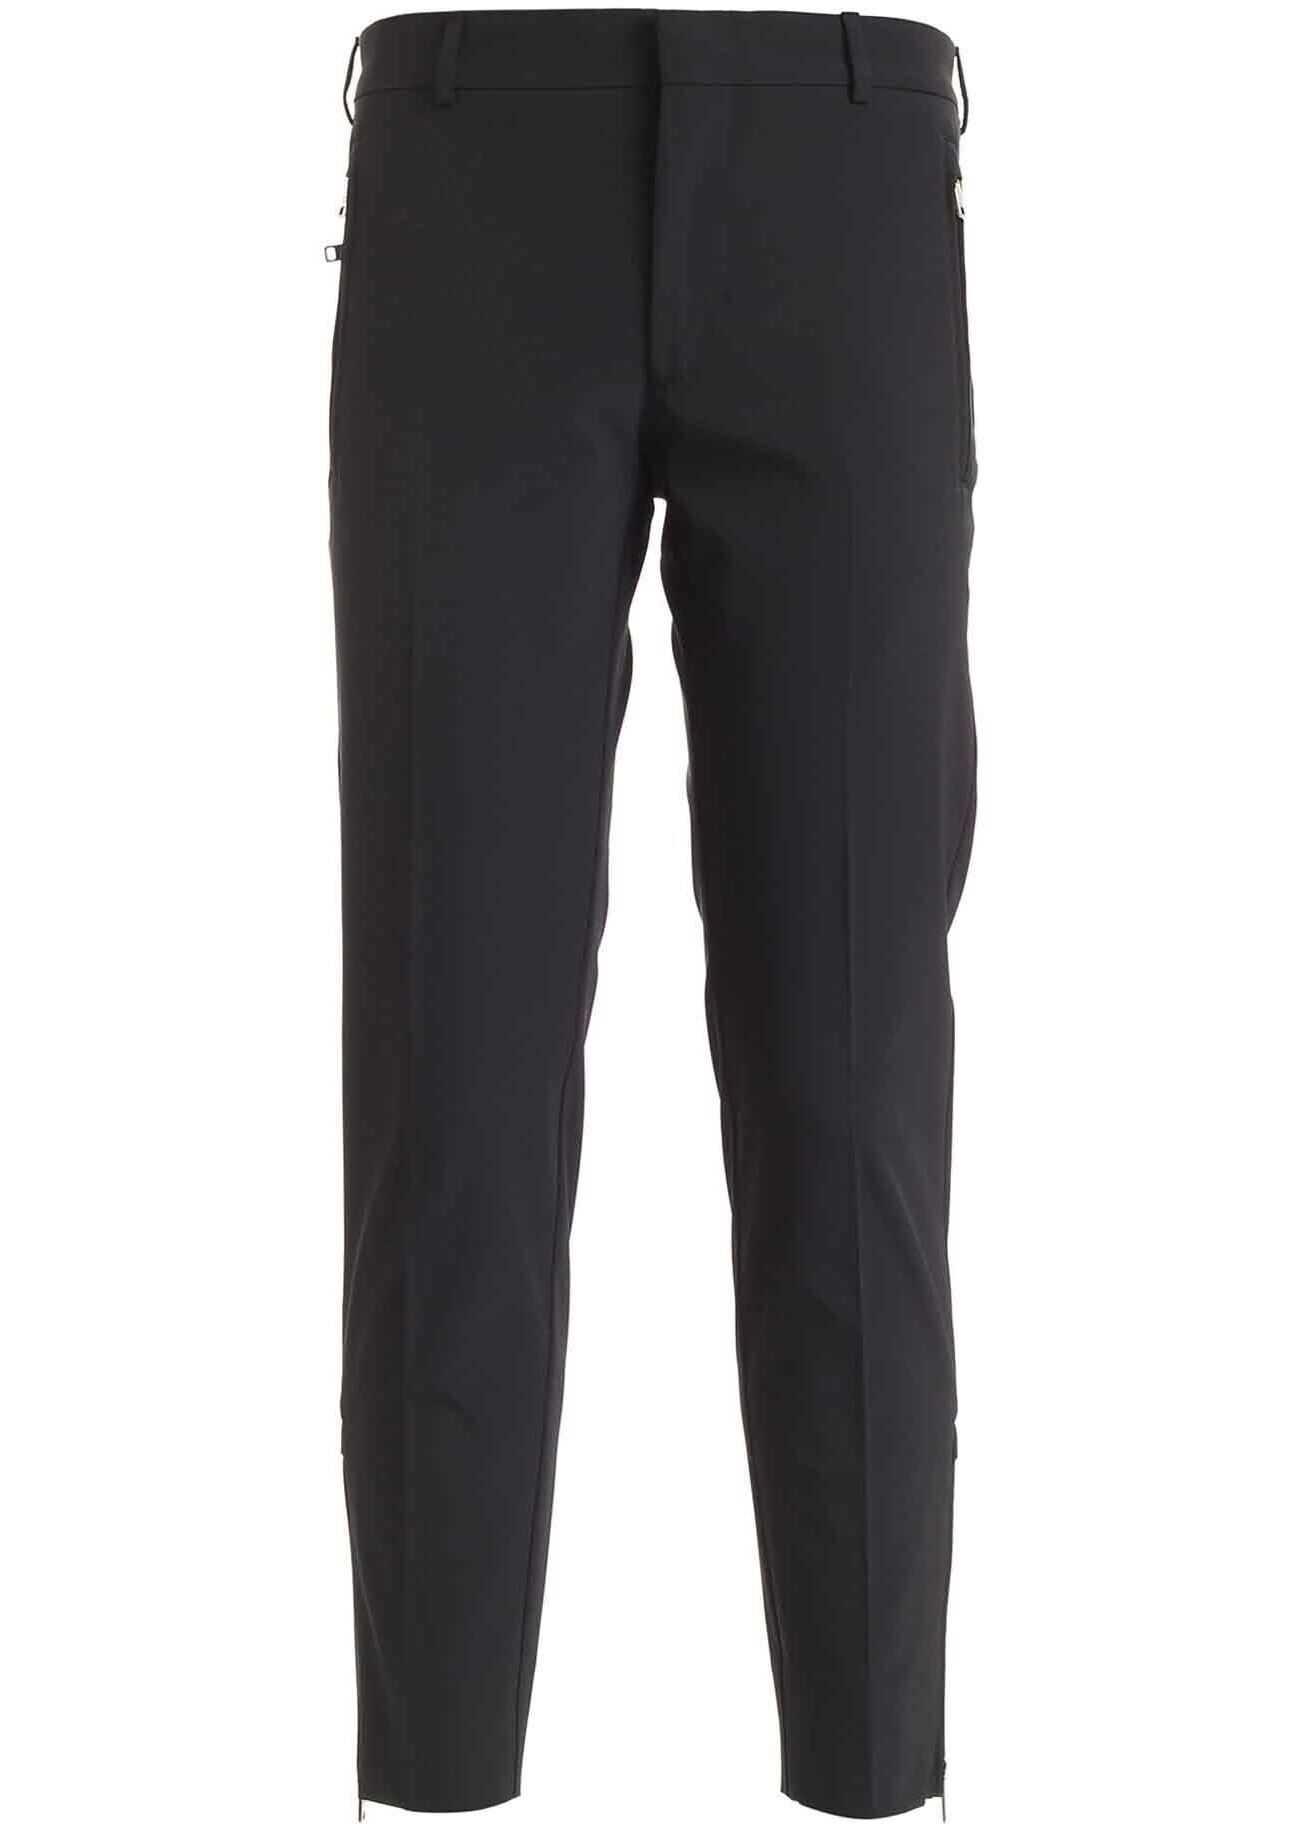 Prada Zipped Pants In Black Black imagine